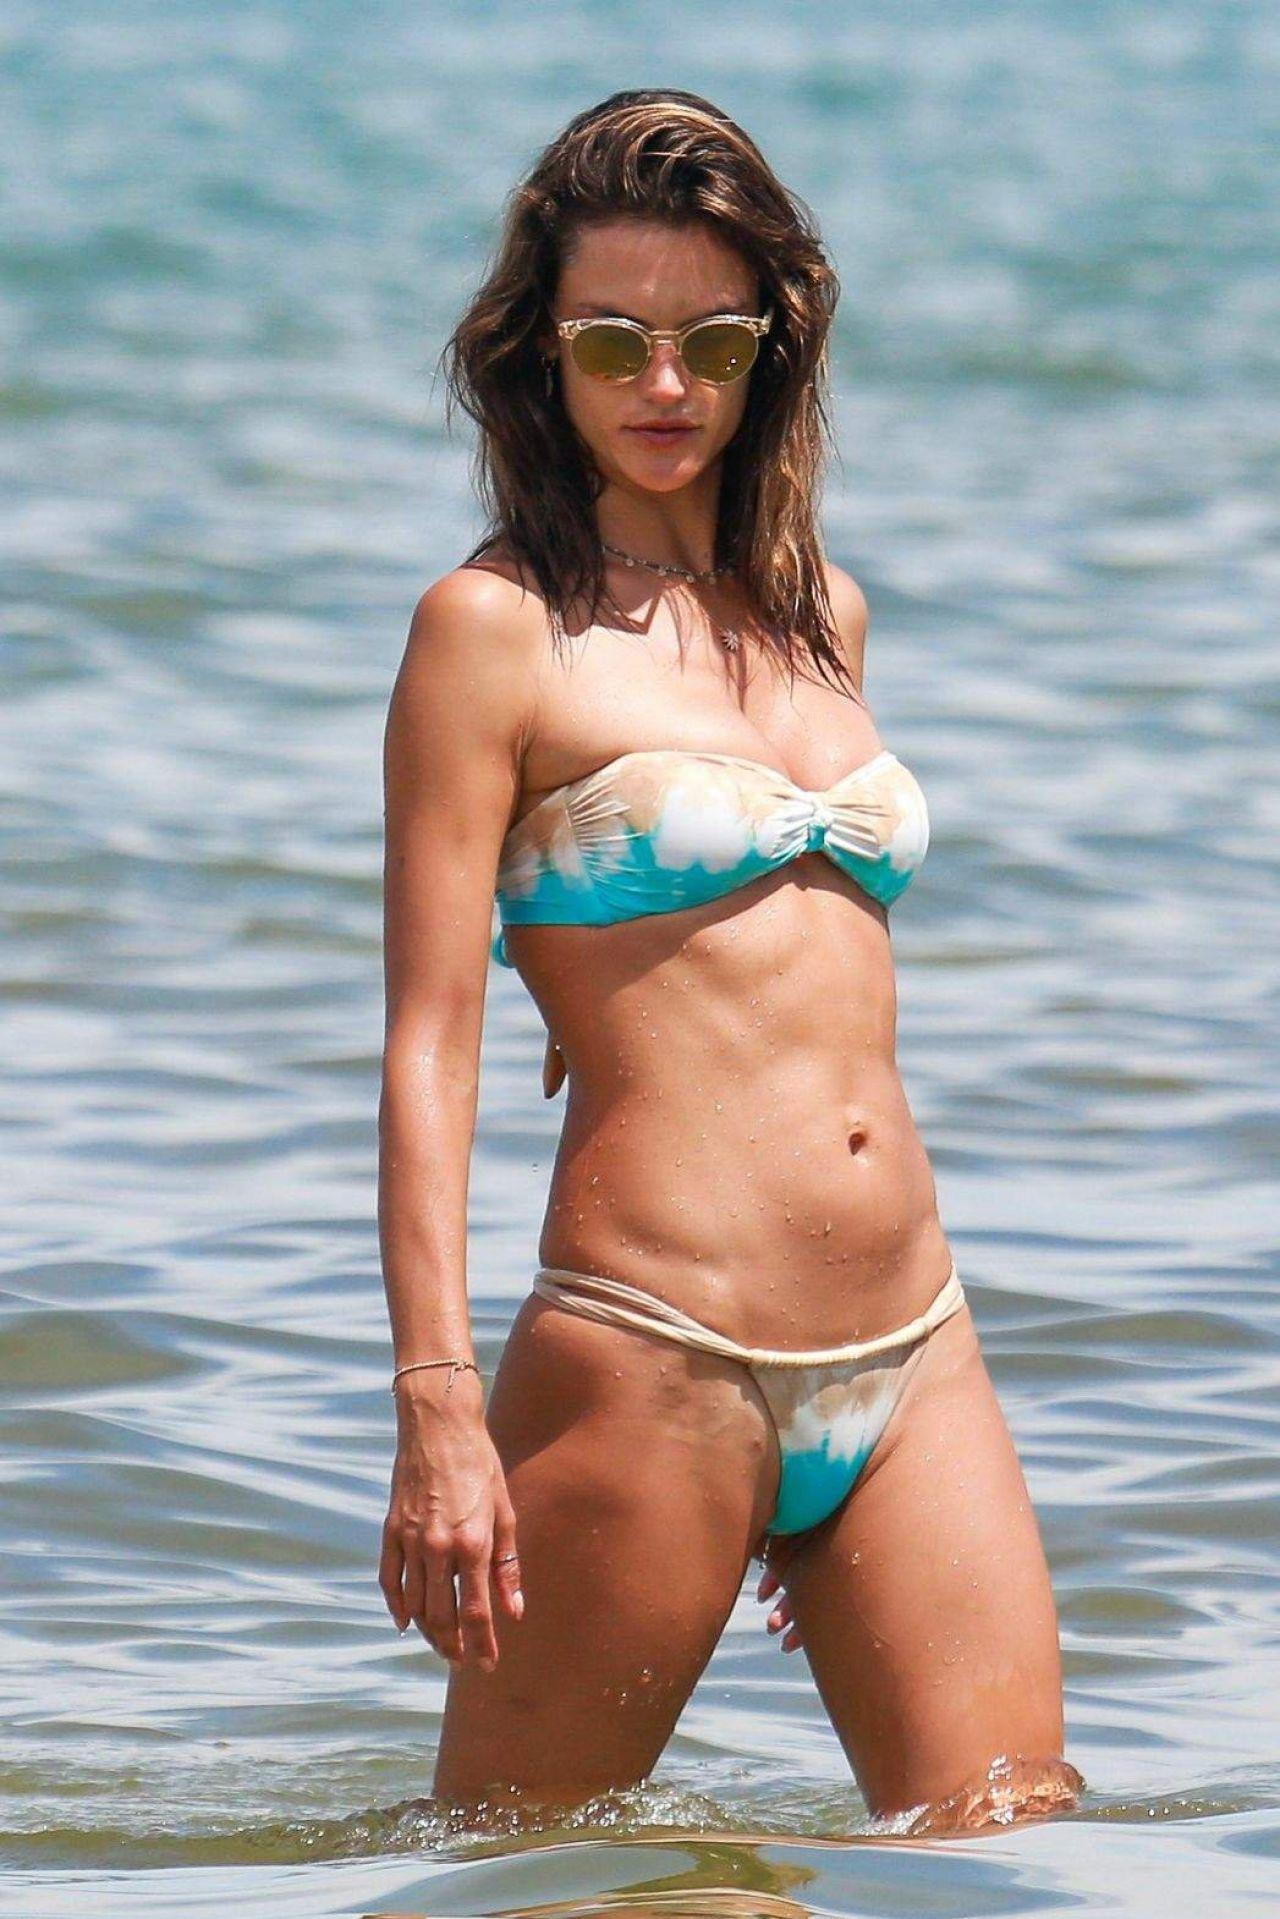 FlorianópolisBrazil 113 2017 Hot Bikini Alessandra Ambrosio In UVpqGSzM